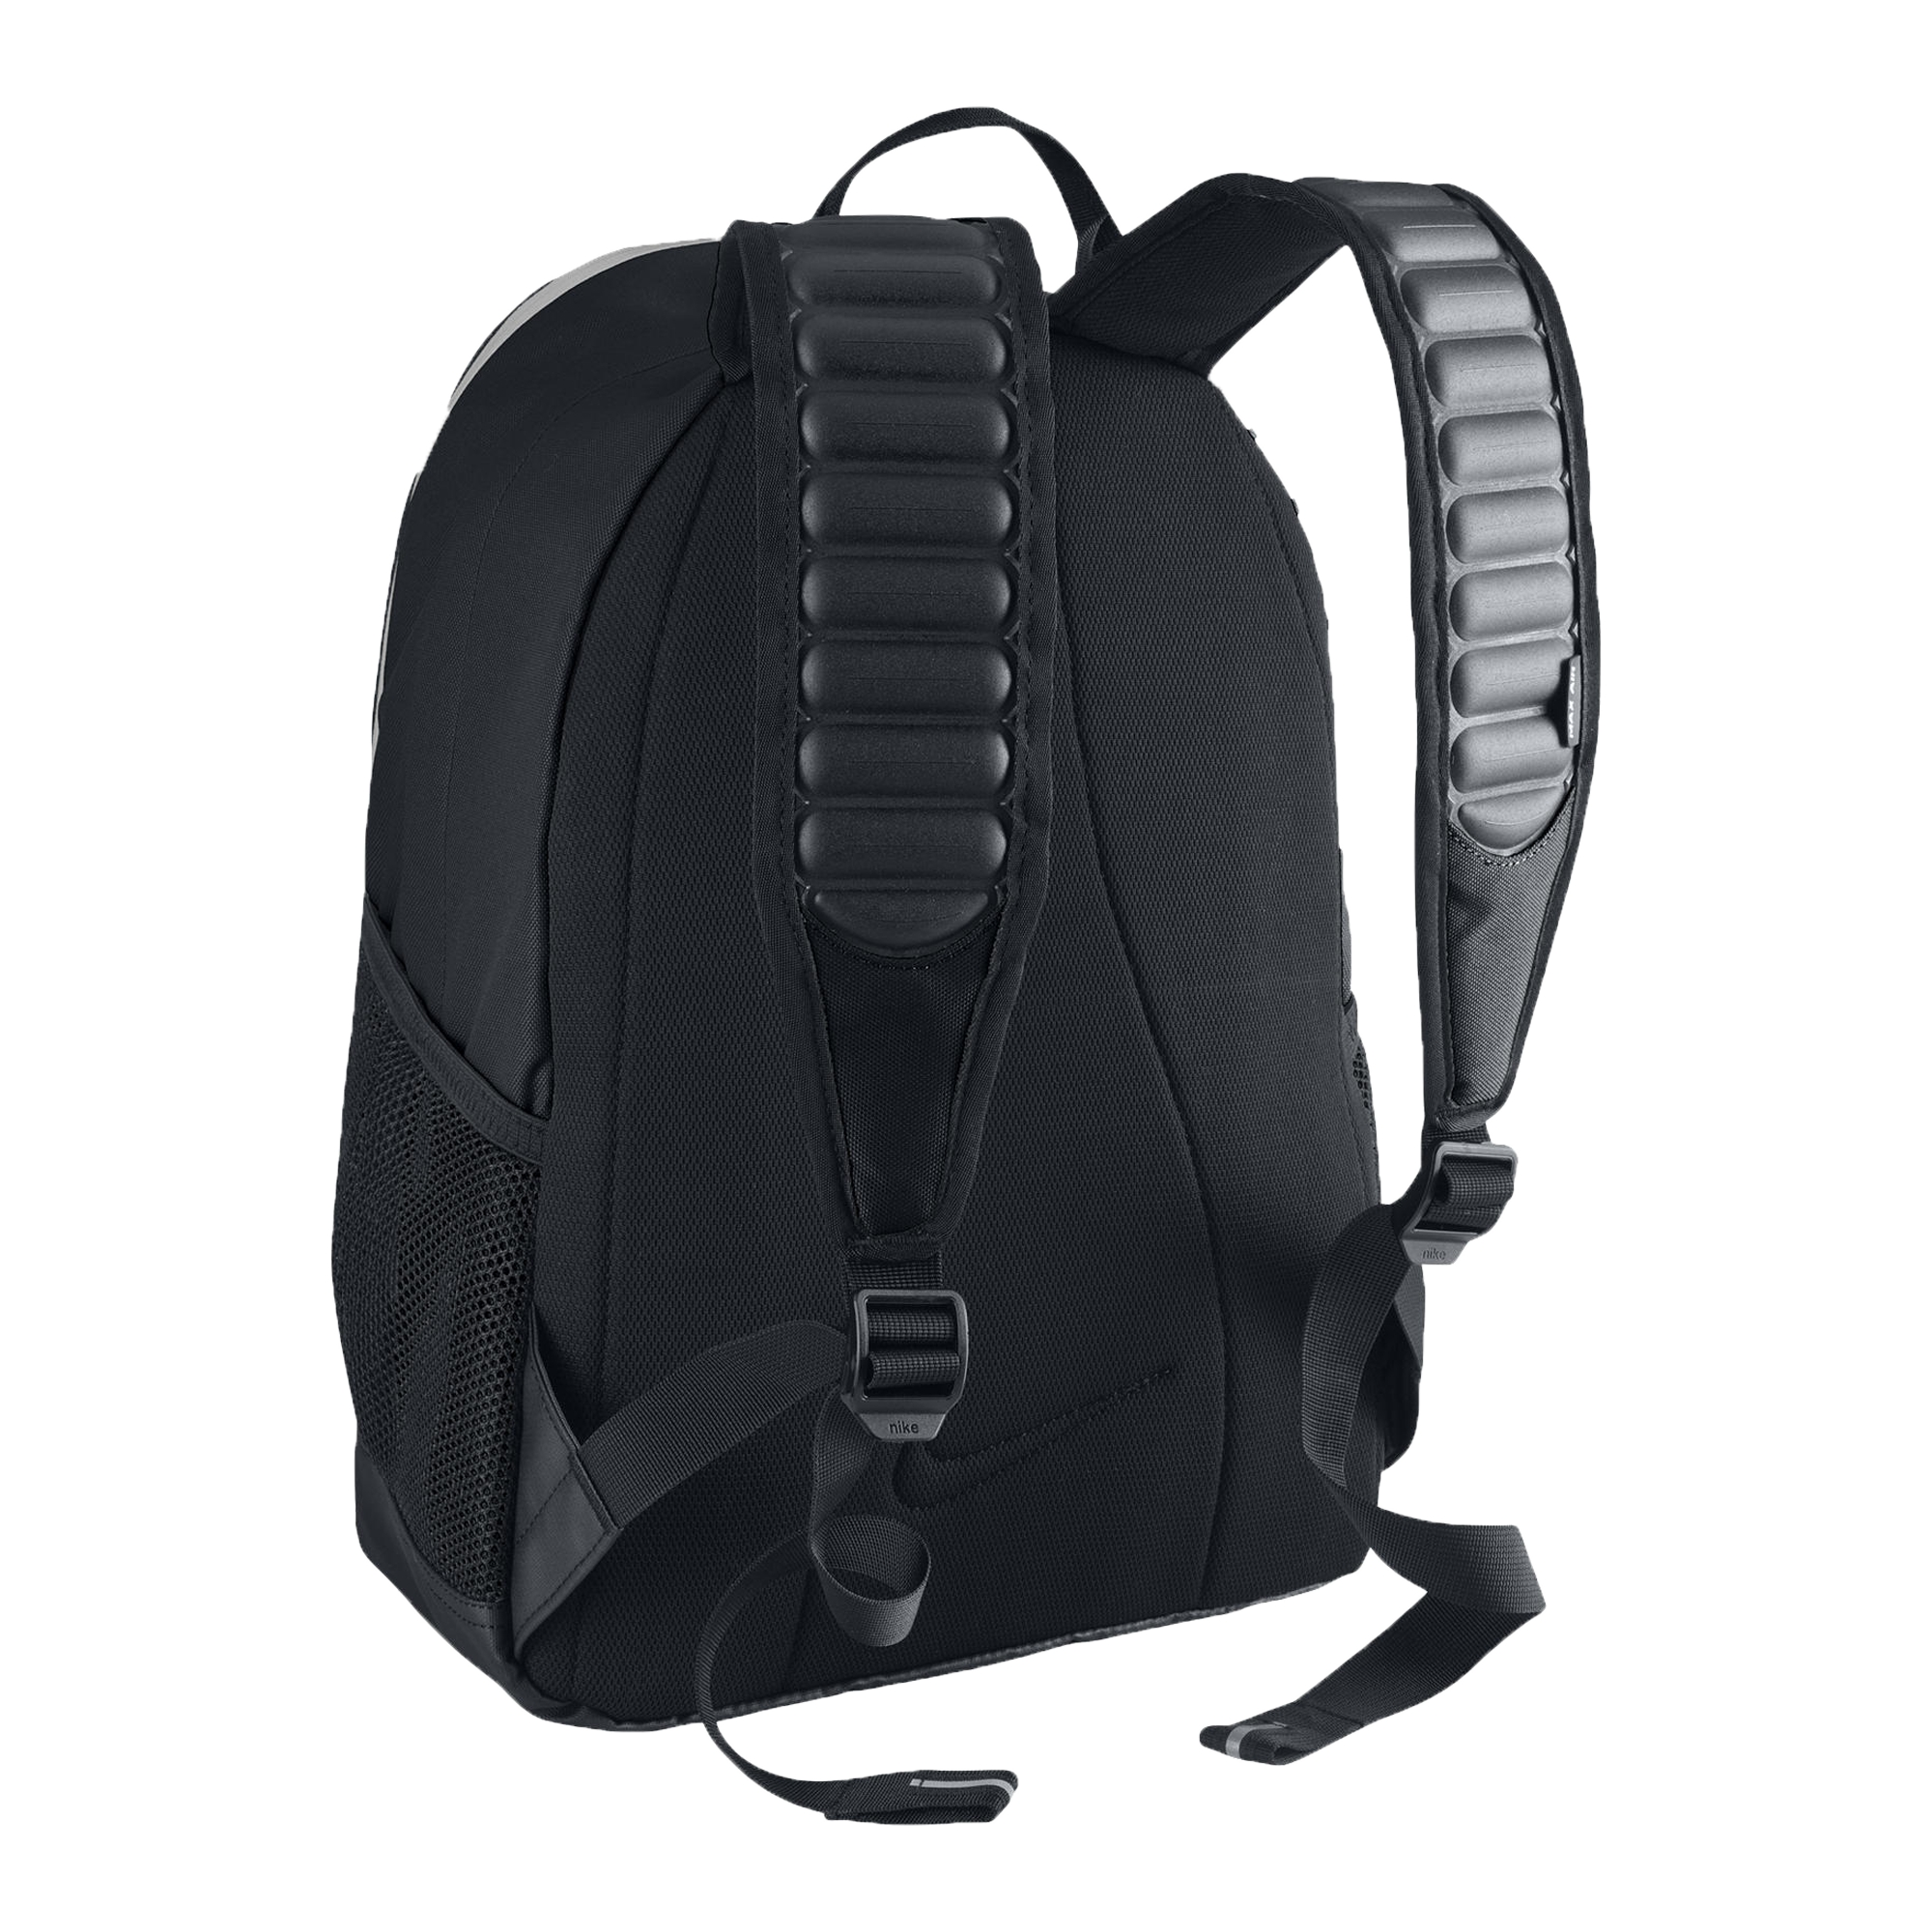 951ab23555d Nike Ya Max Air Tt Backpack CO Sırt Çantası  BA4736-001 - Barcin.com